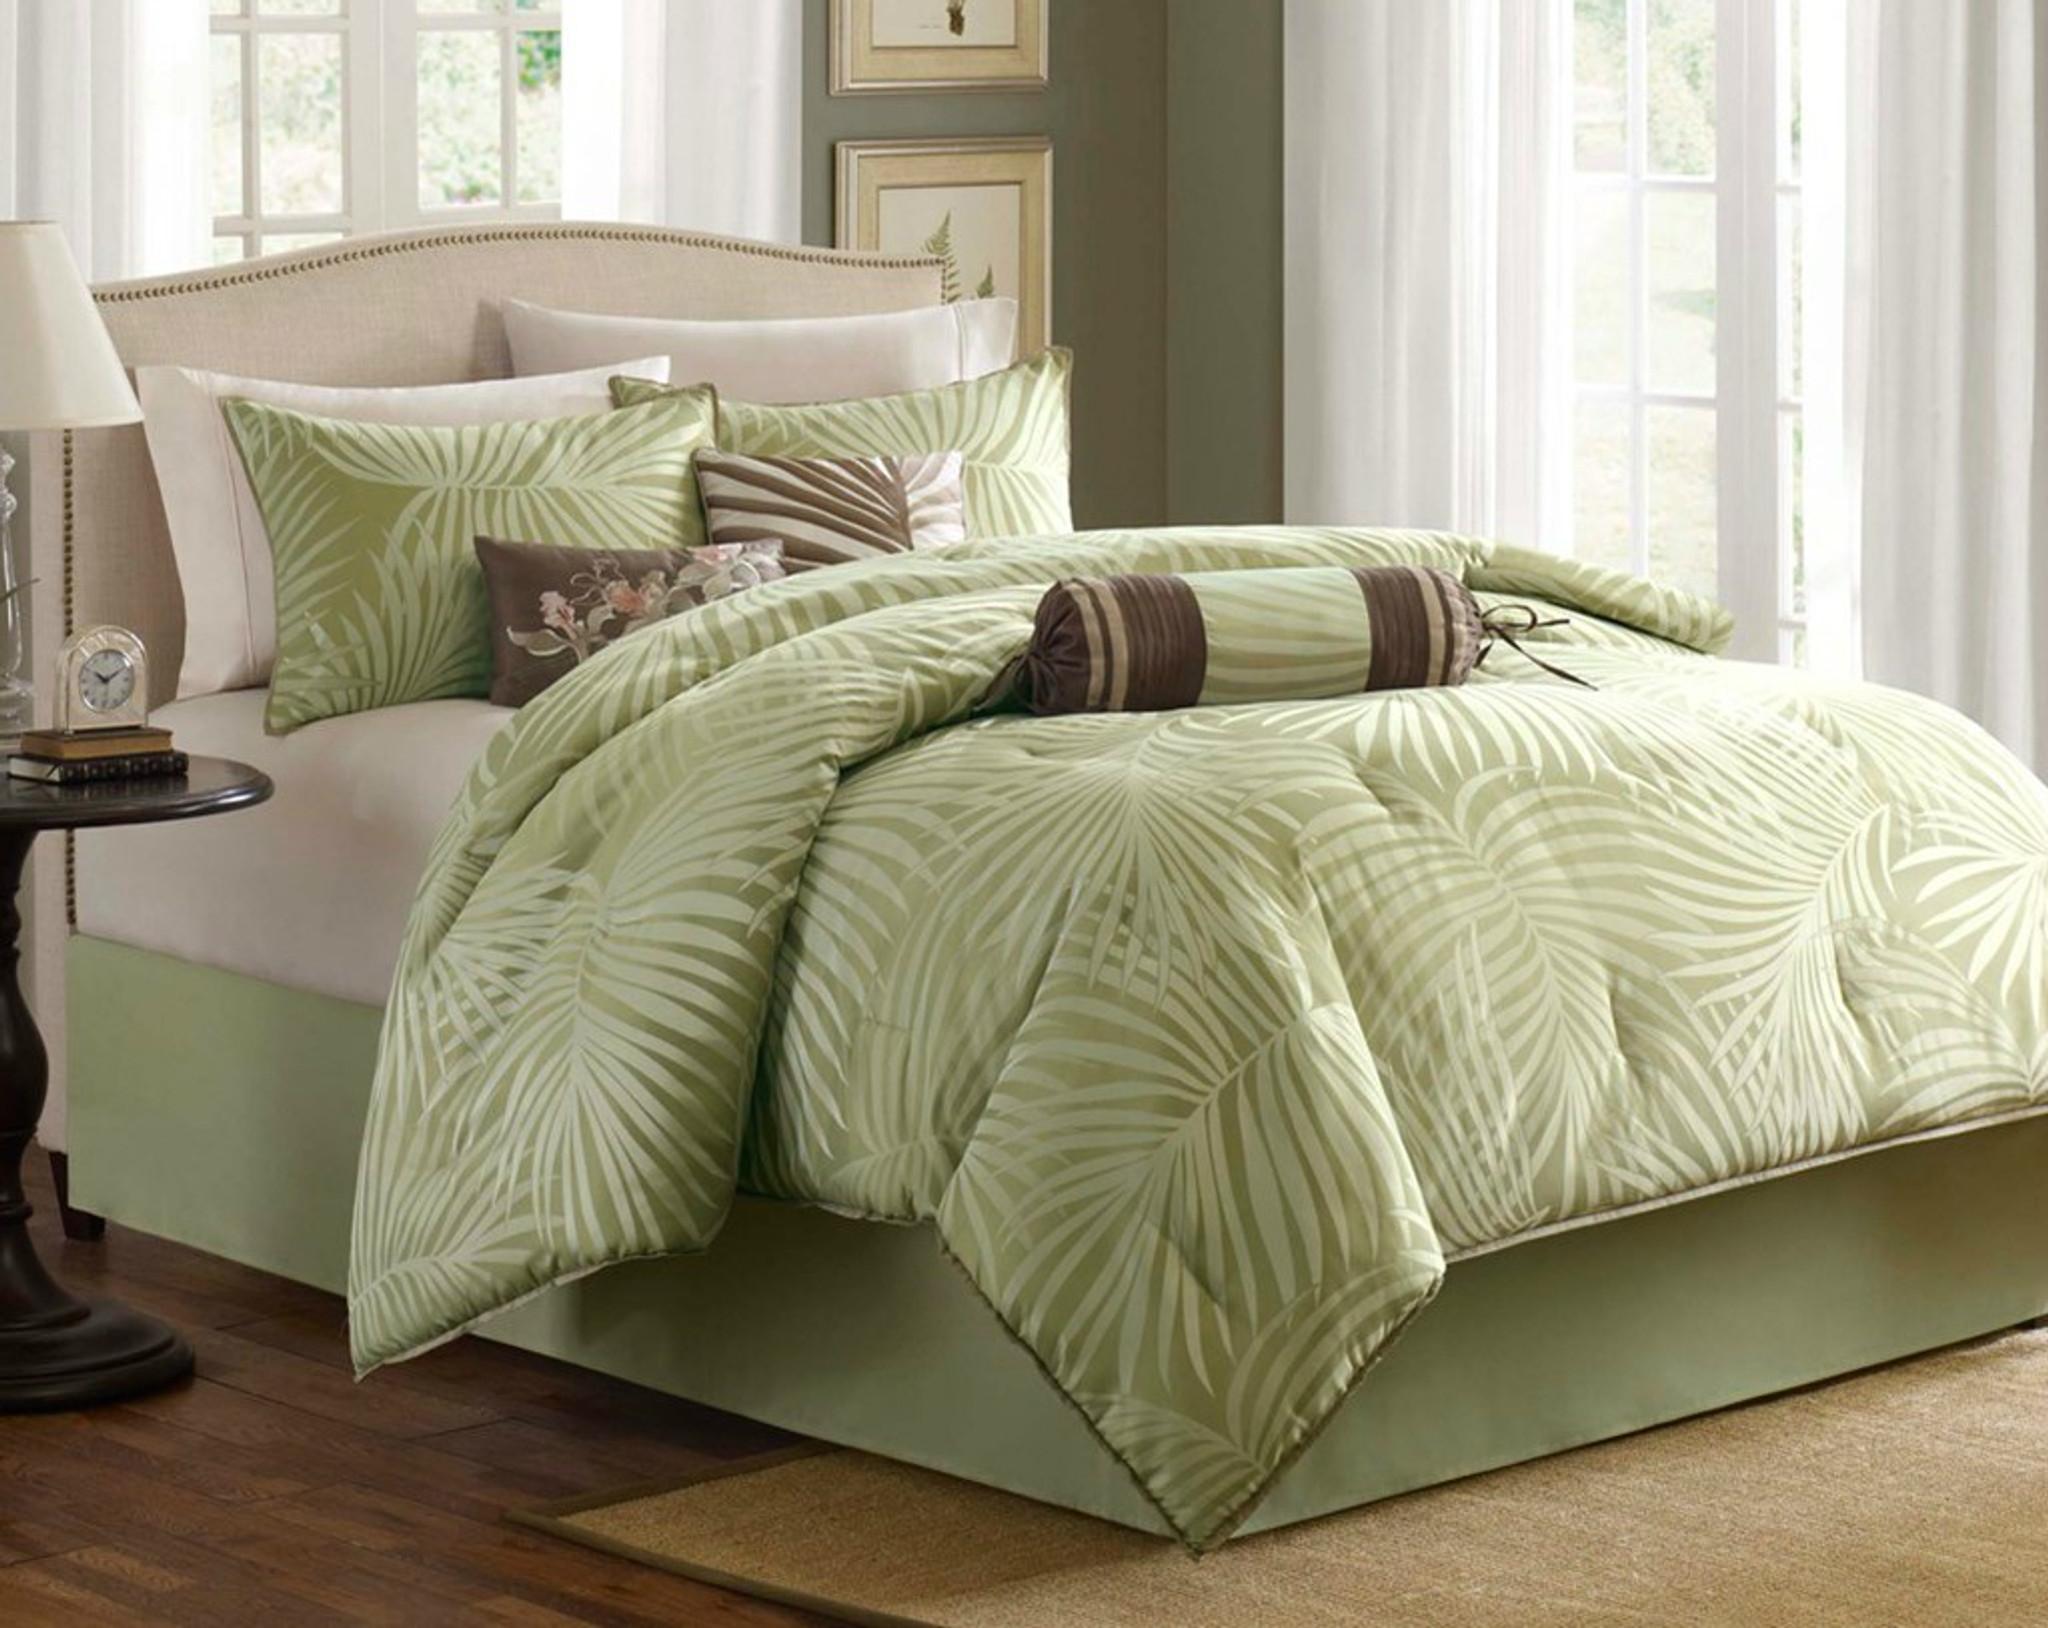 Bermuda Palms Comforter Set